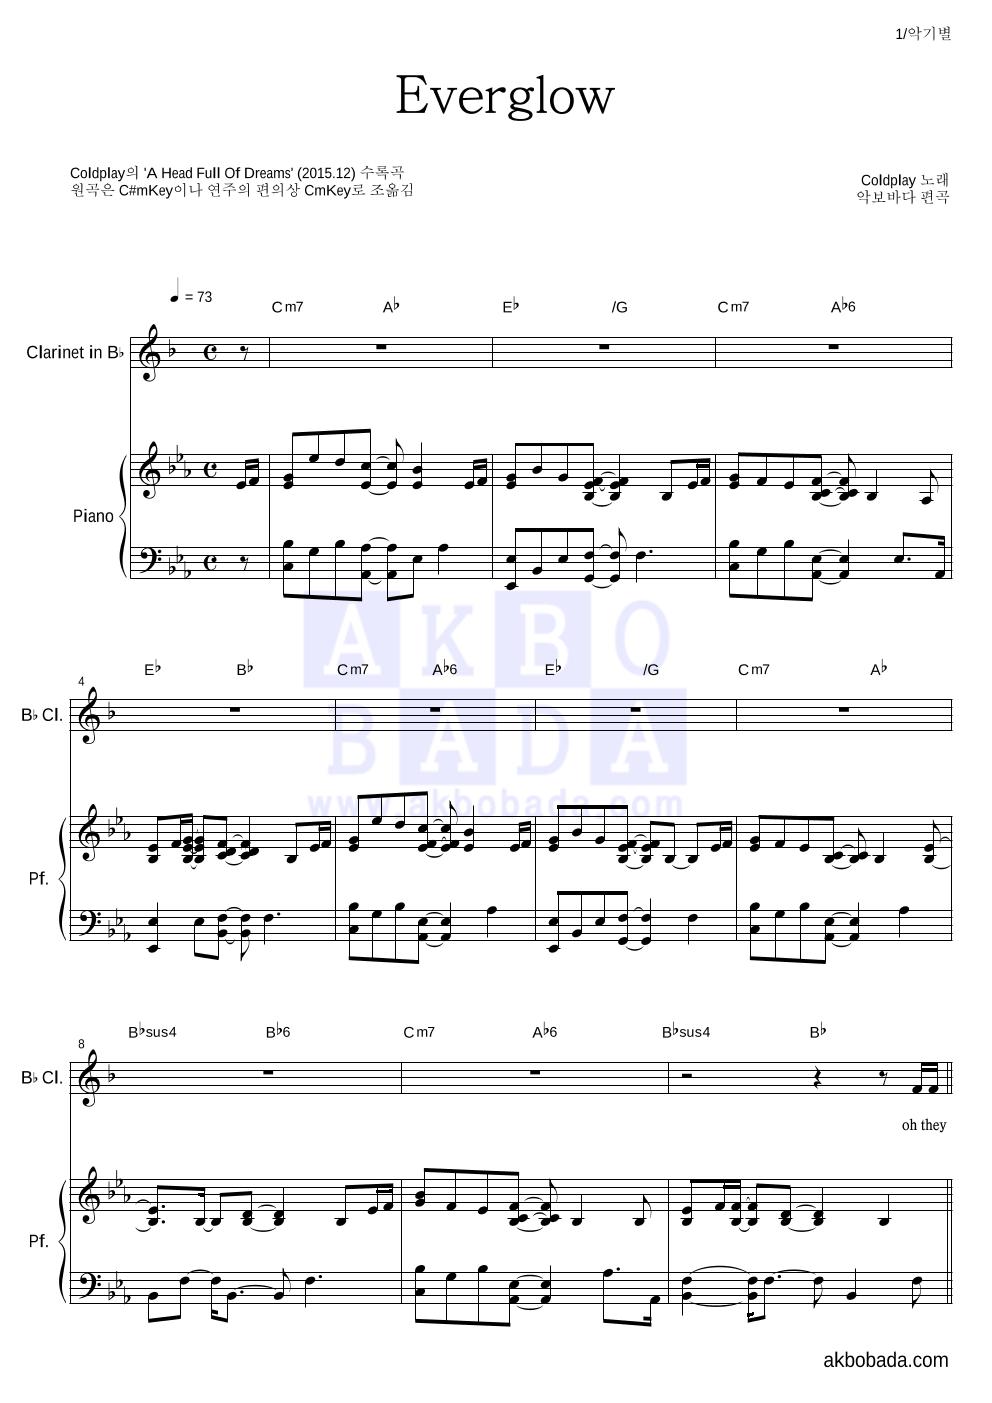 Coldplay - Everglow 클라리넷&피아노 악보